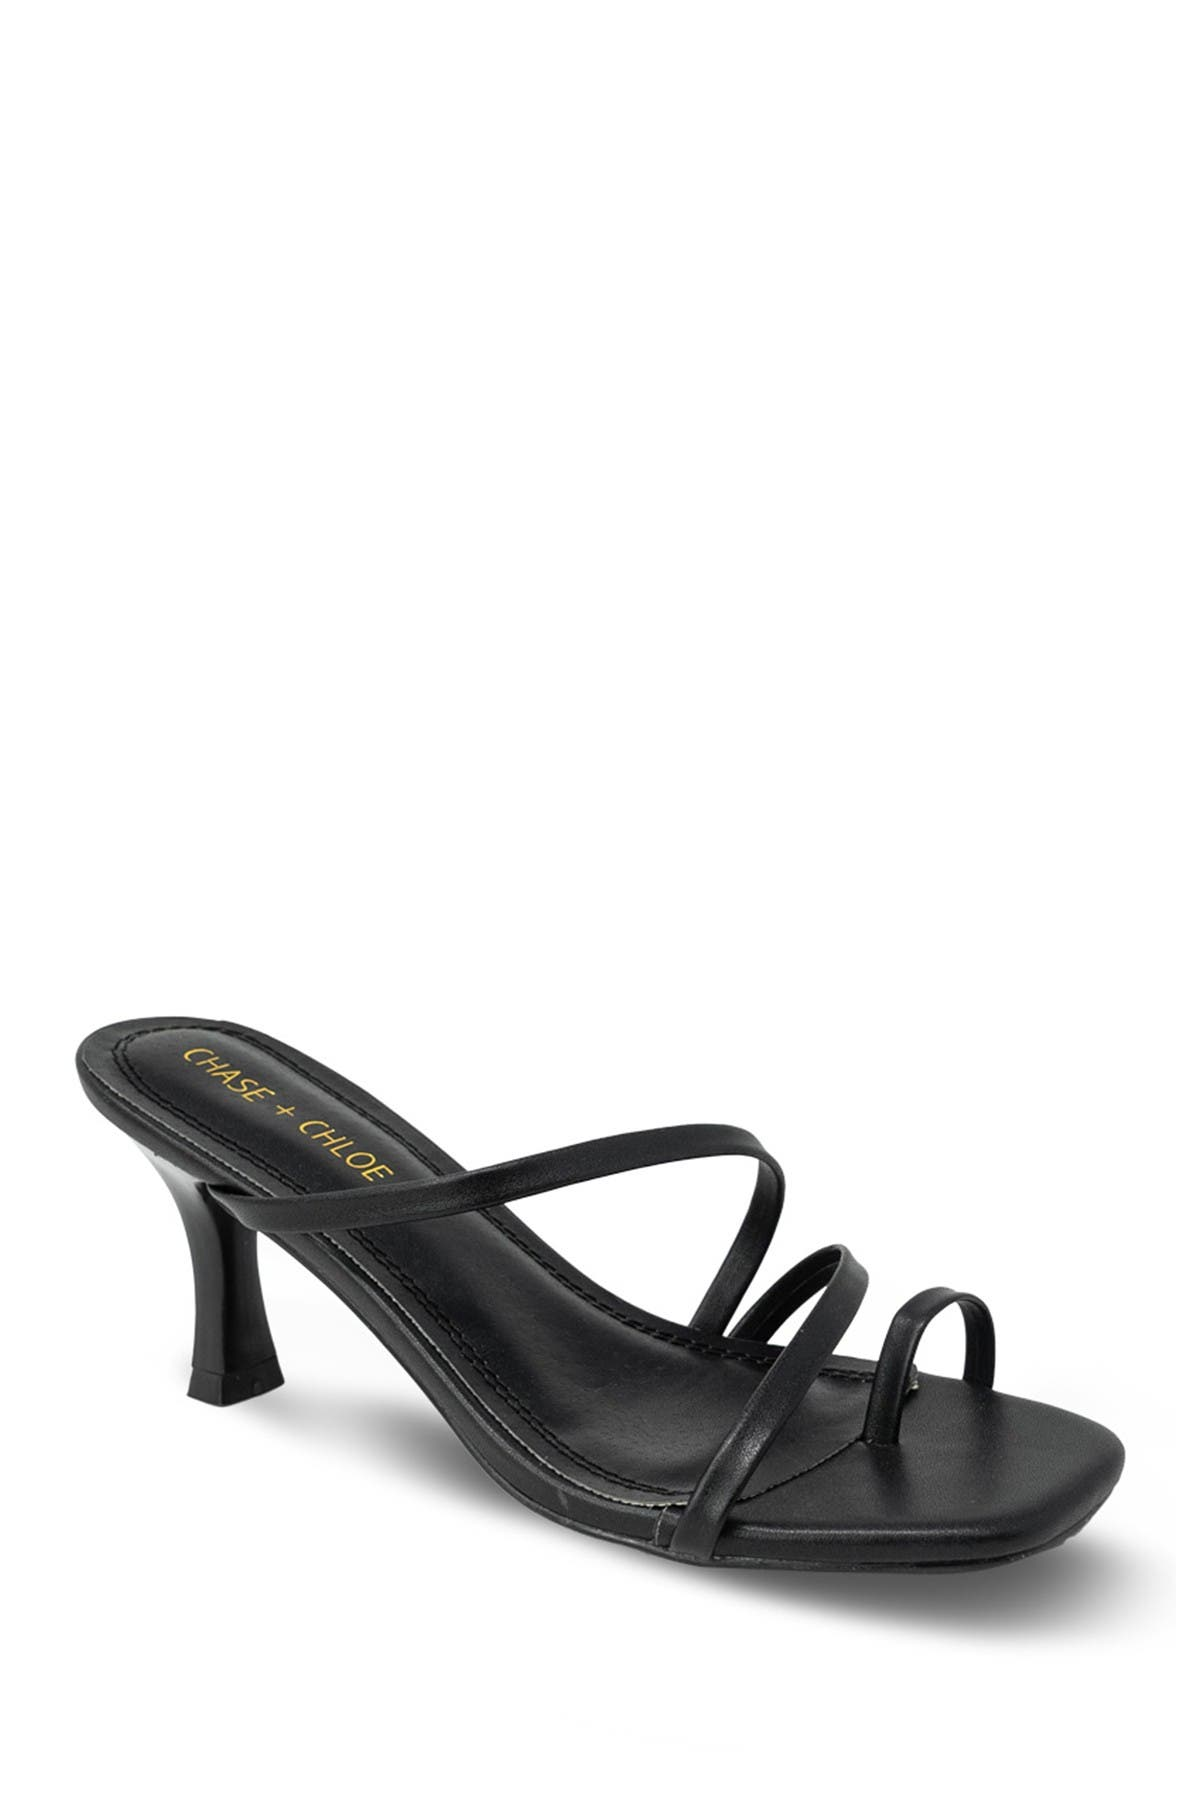 Image of Chase & Chloe Kitty Slip-On Low Heel Sandal